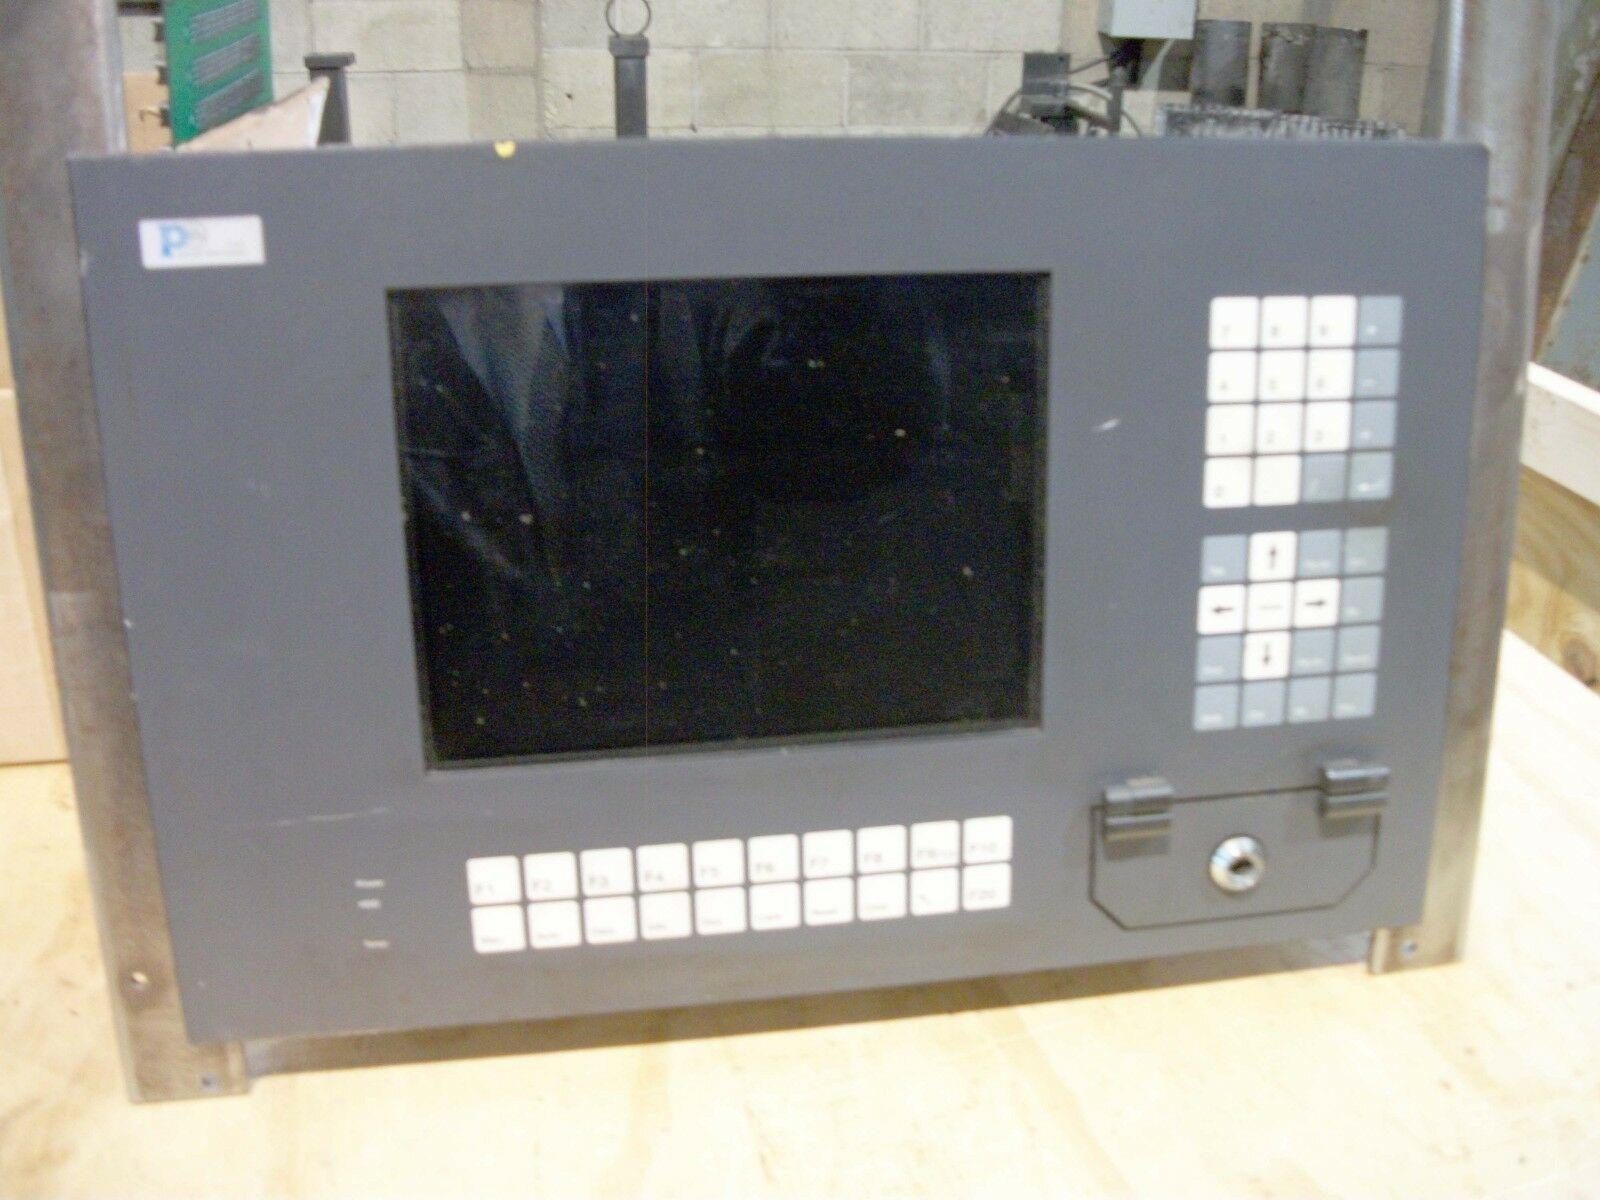 PE Panel Electronics Operator Station CRT Unit FDR-S